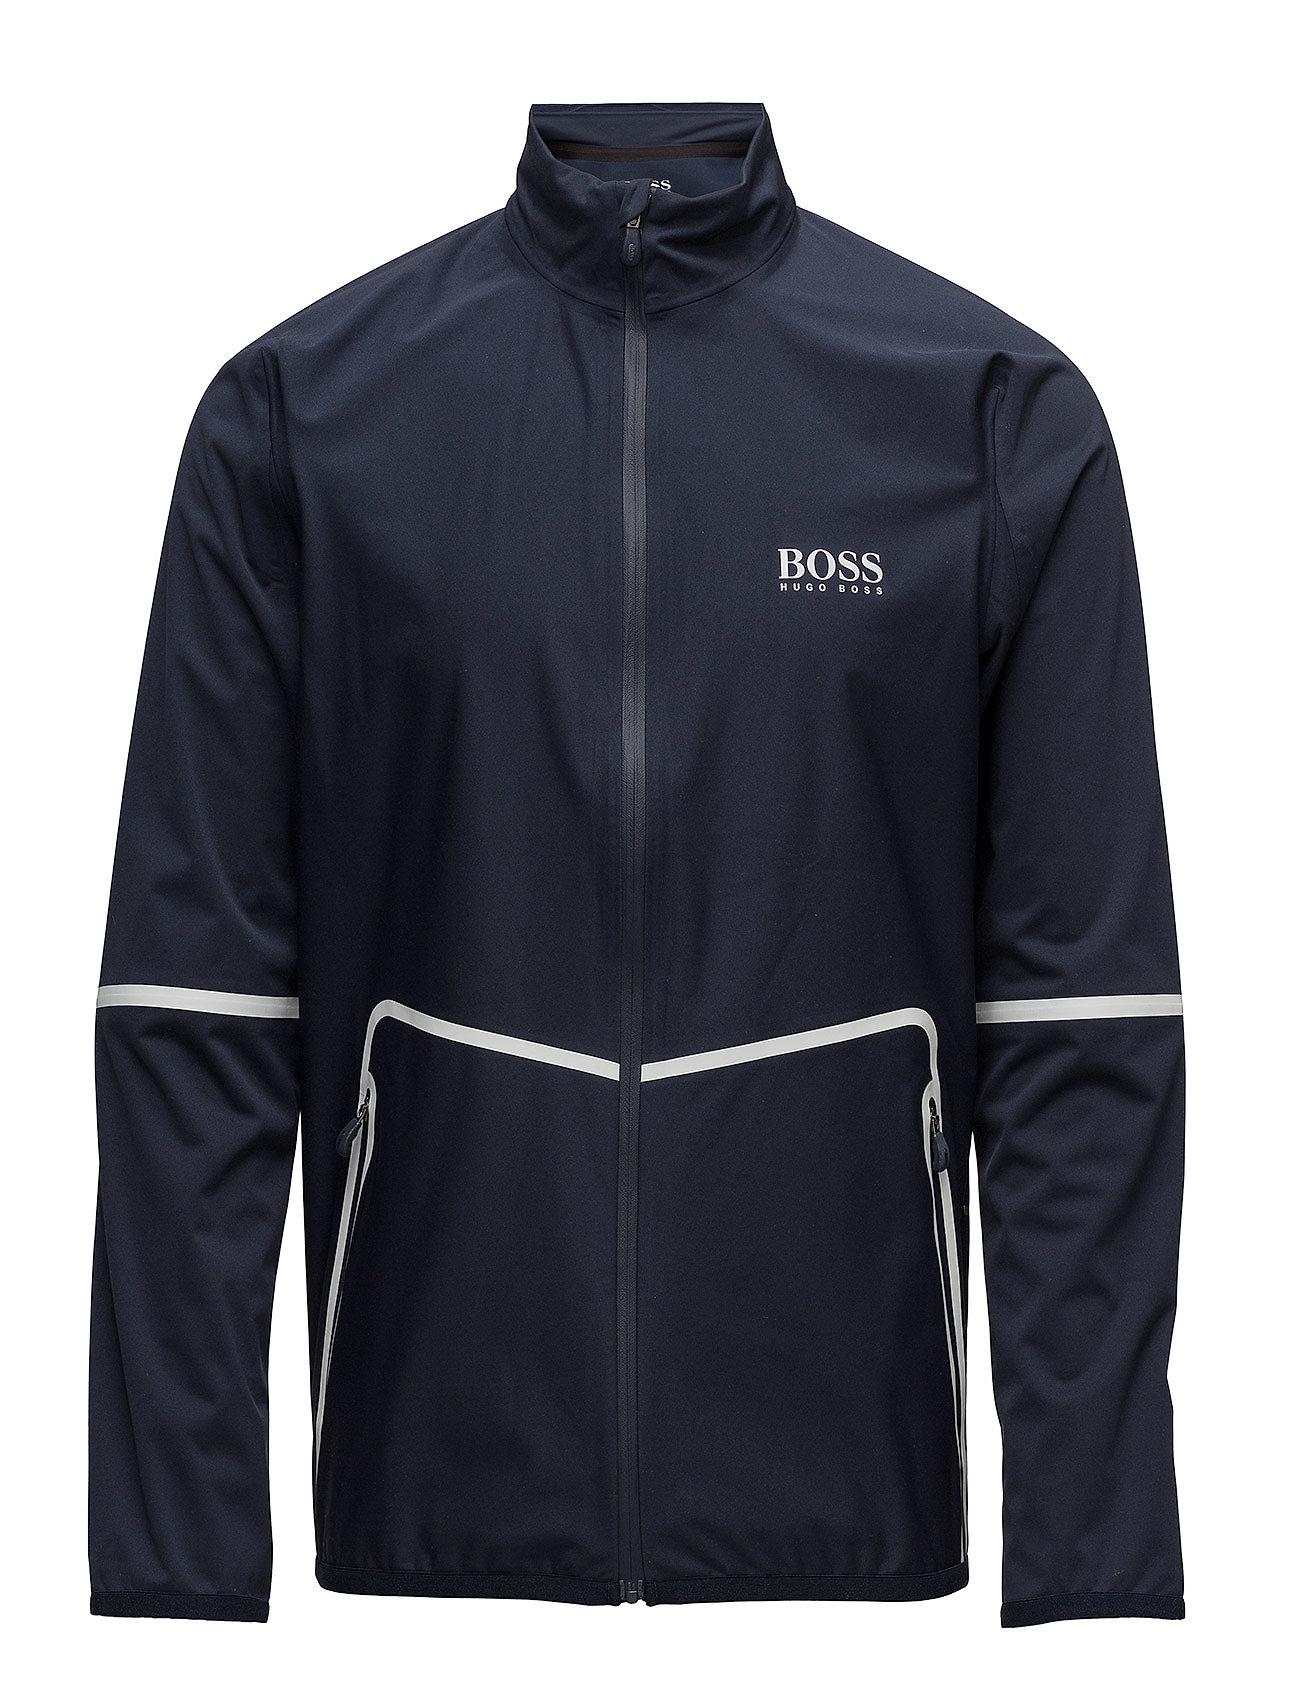 Sweatshirt & Hoodie Sale - Swalay Pro